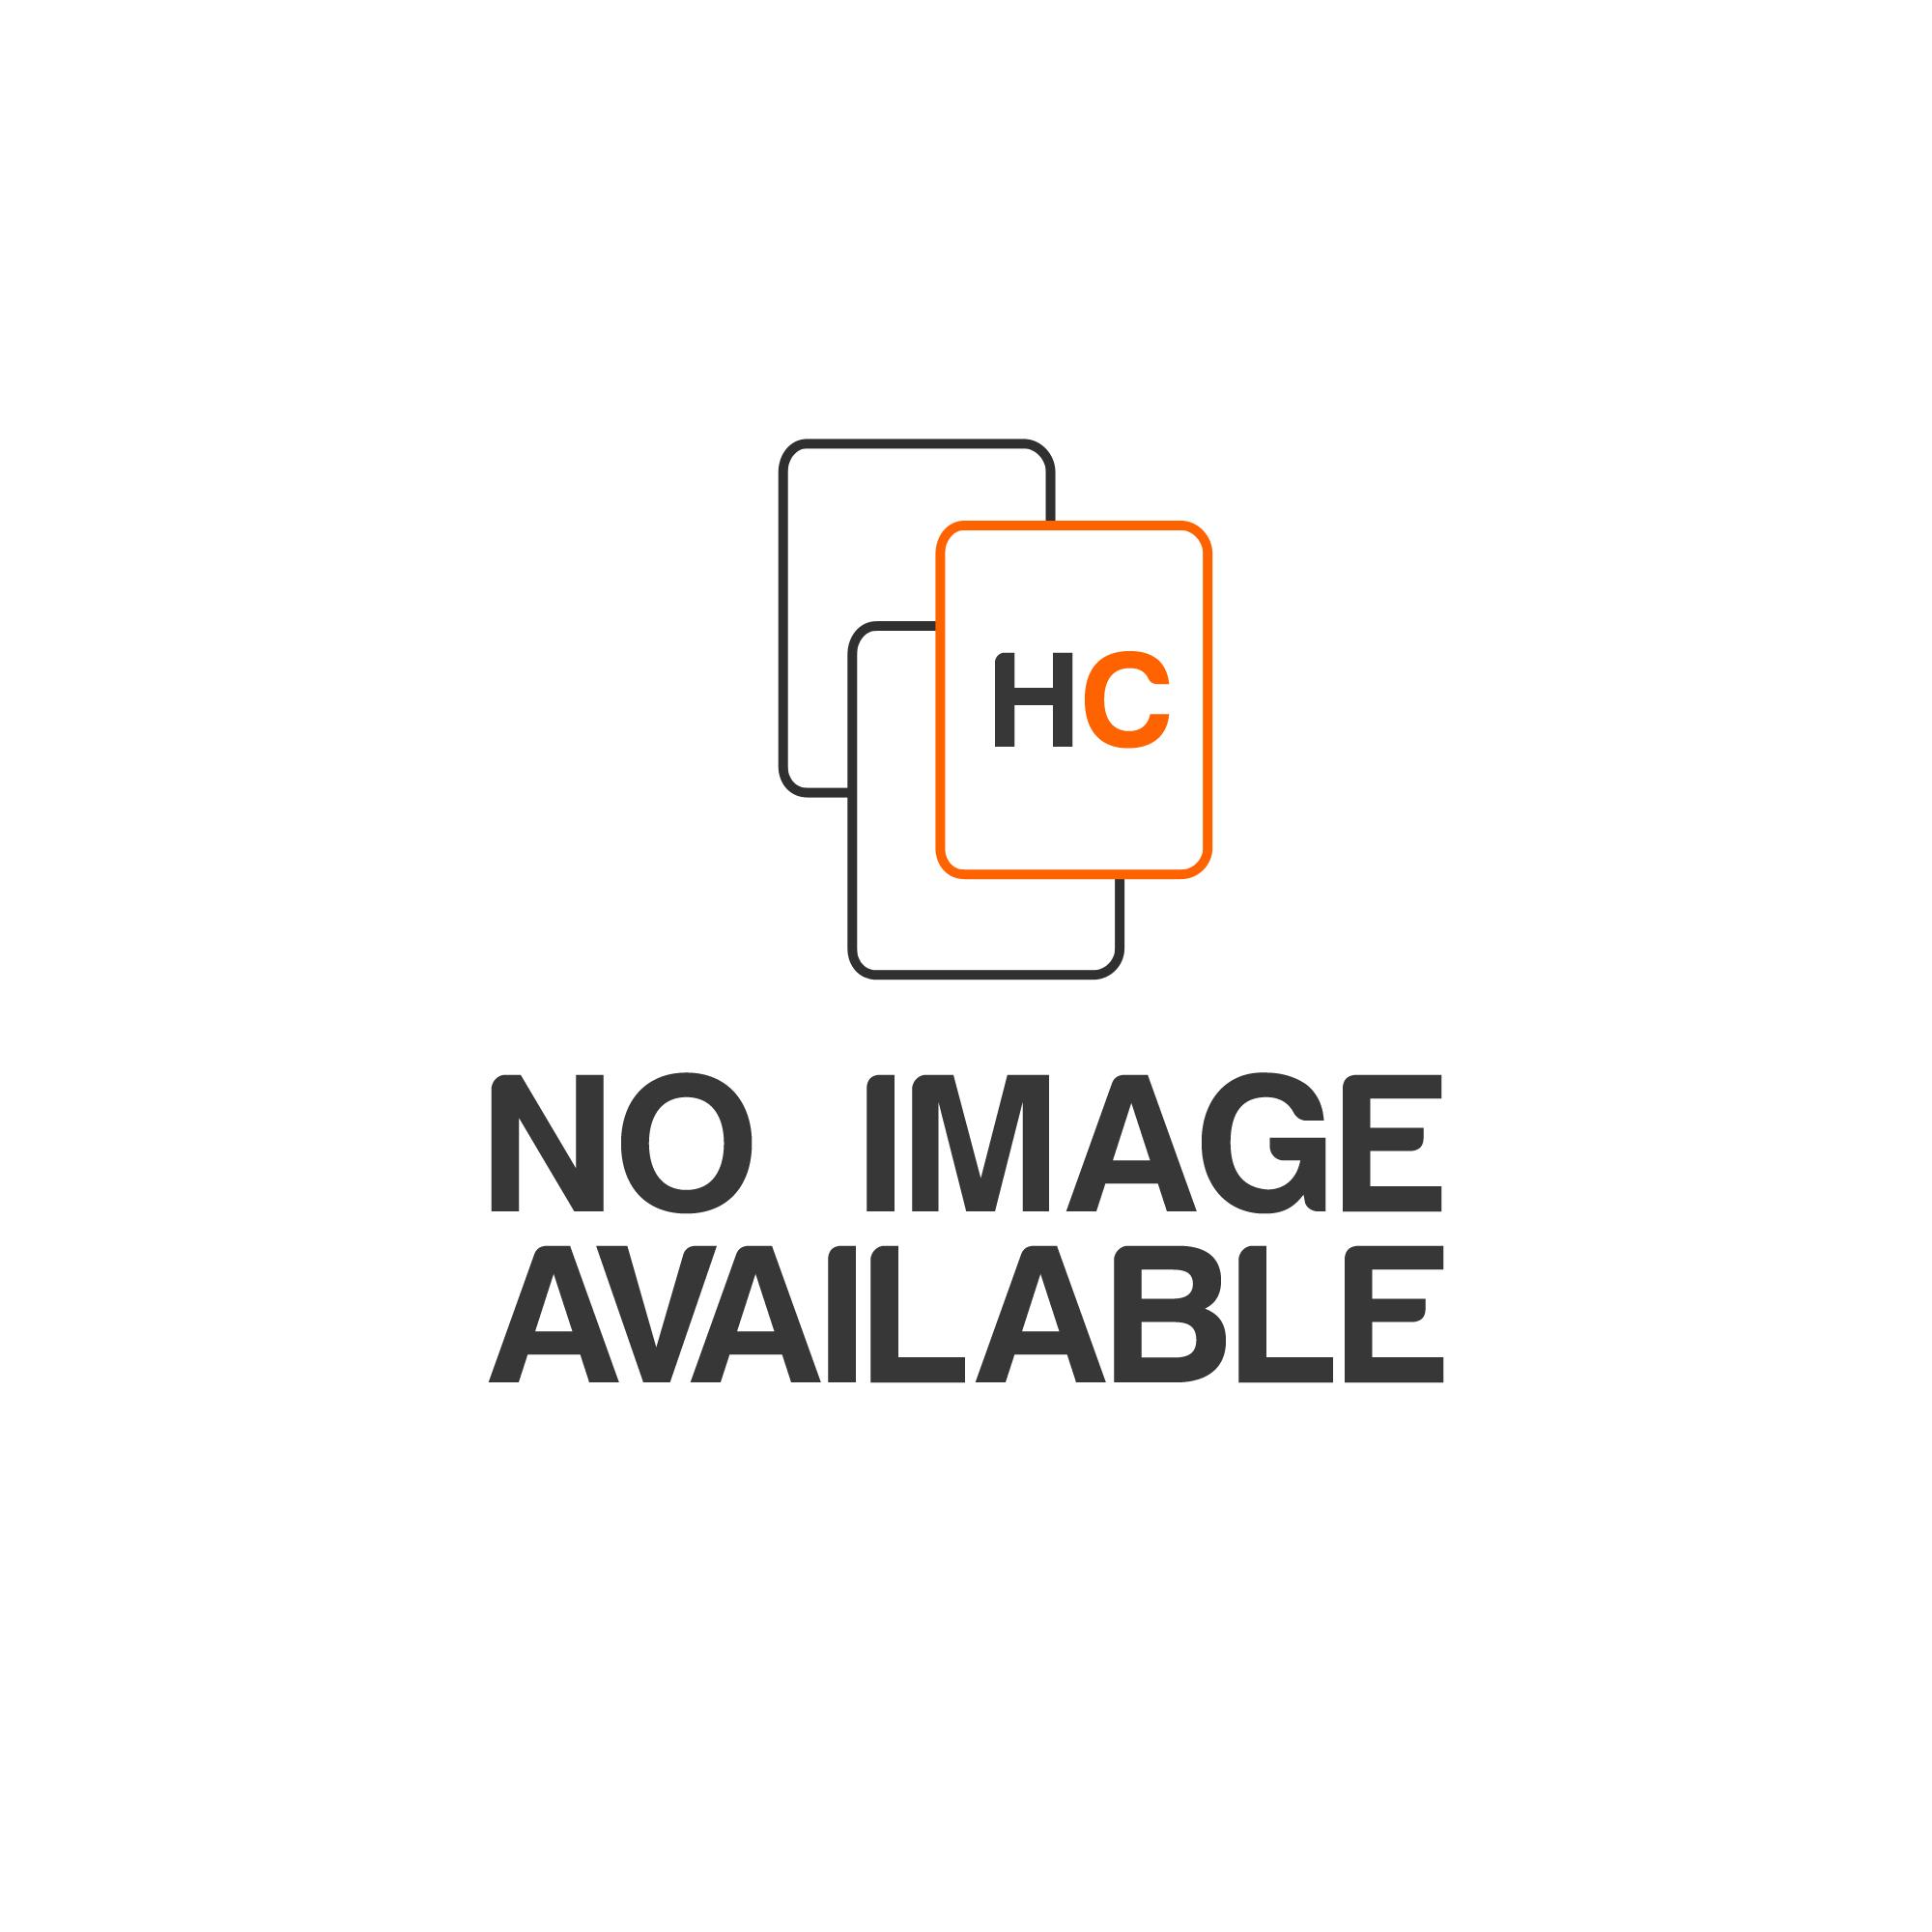 YUGIOH HOLO CARD LANPHORHYNCHUS DUDE-EN021 1ST EDITION